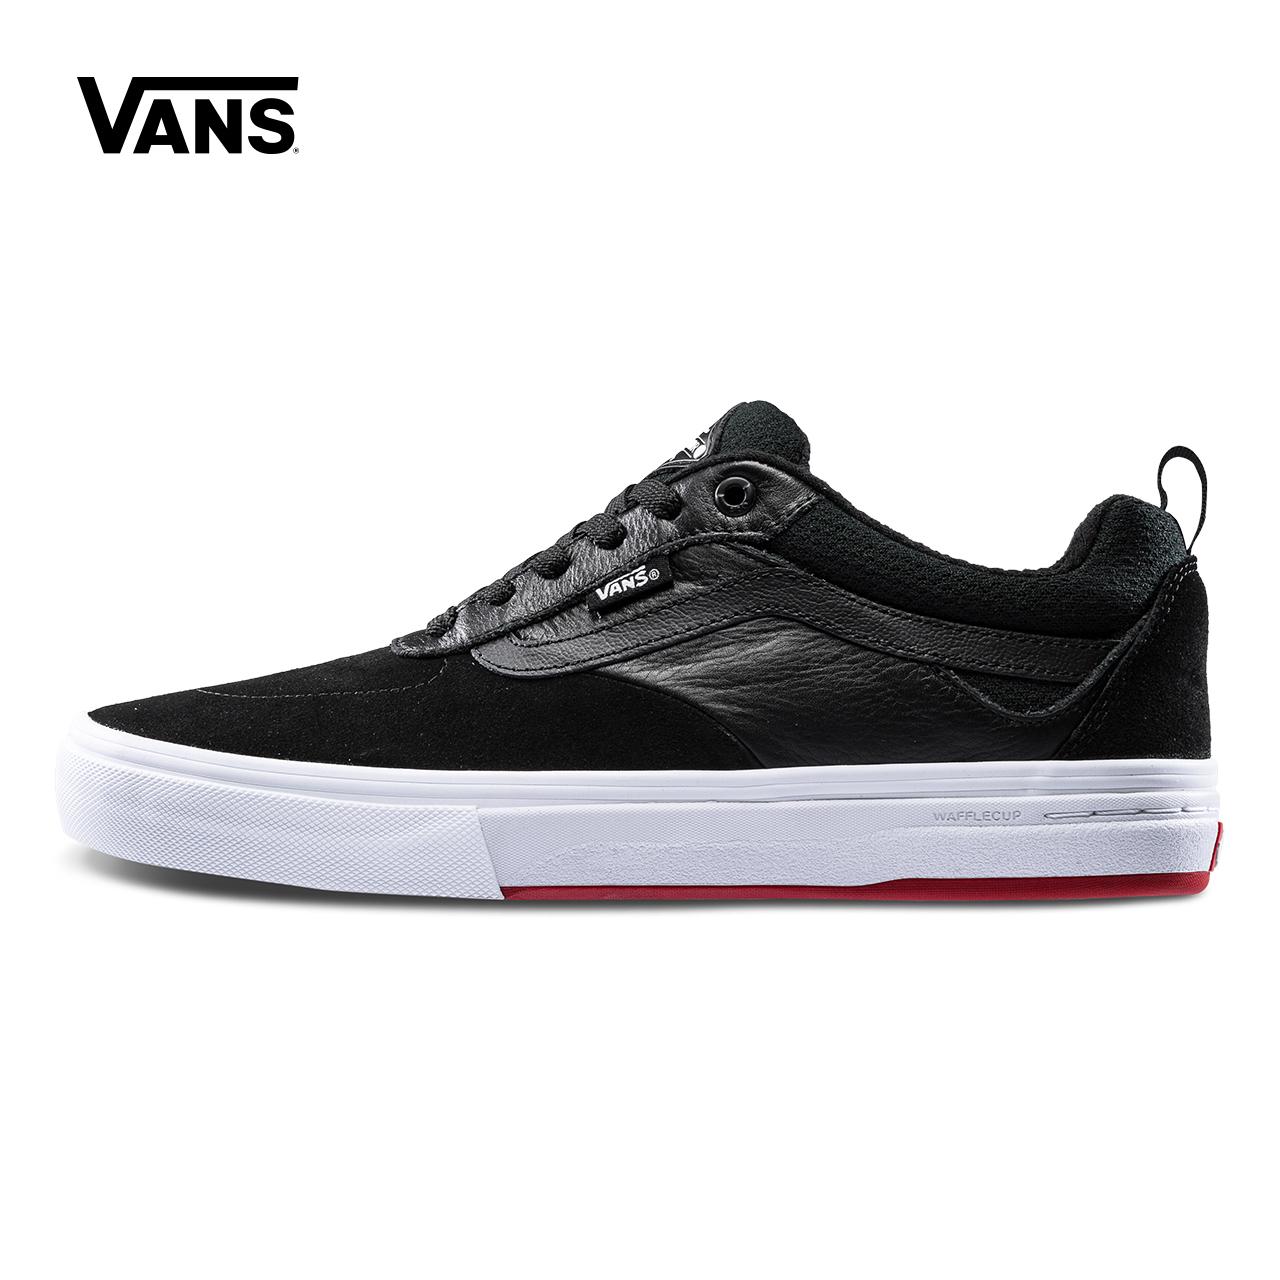 Vans 范斯官方秋季男款滑板鞋|VN0A2XSG458